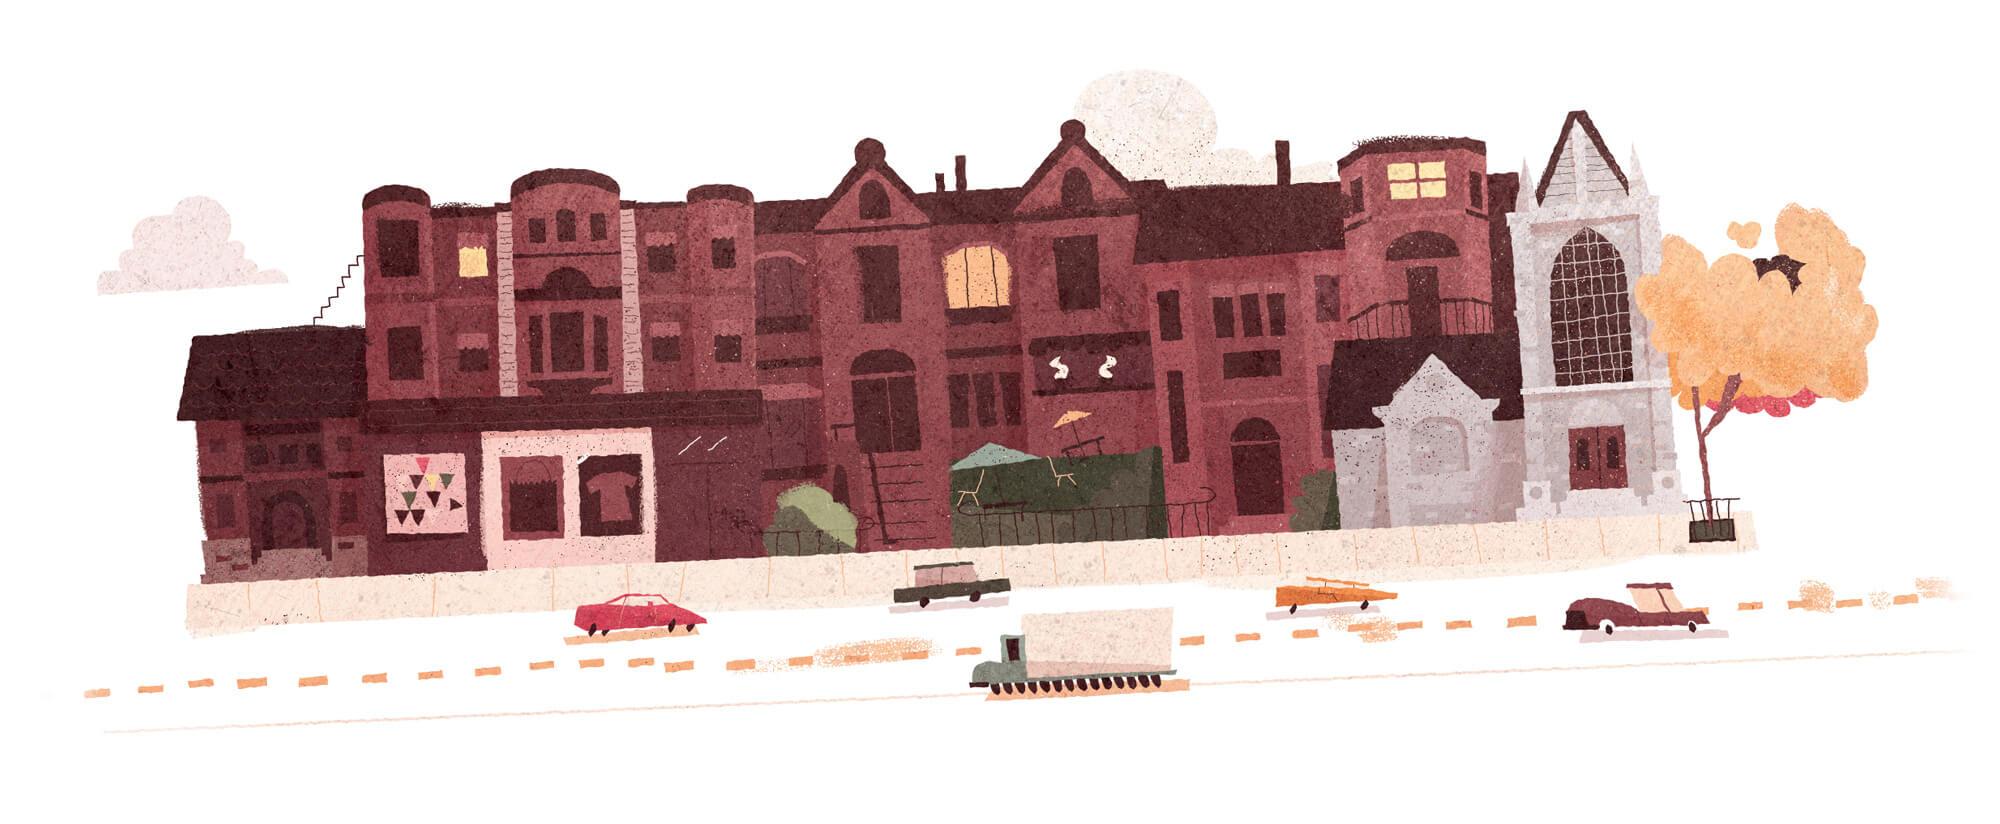 Uber-Kirk.Wallace-icons-newbury.street.jpg